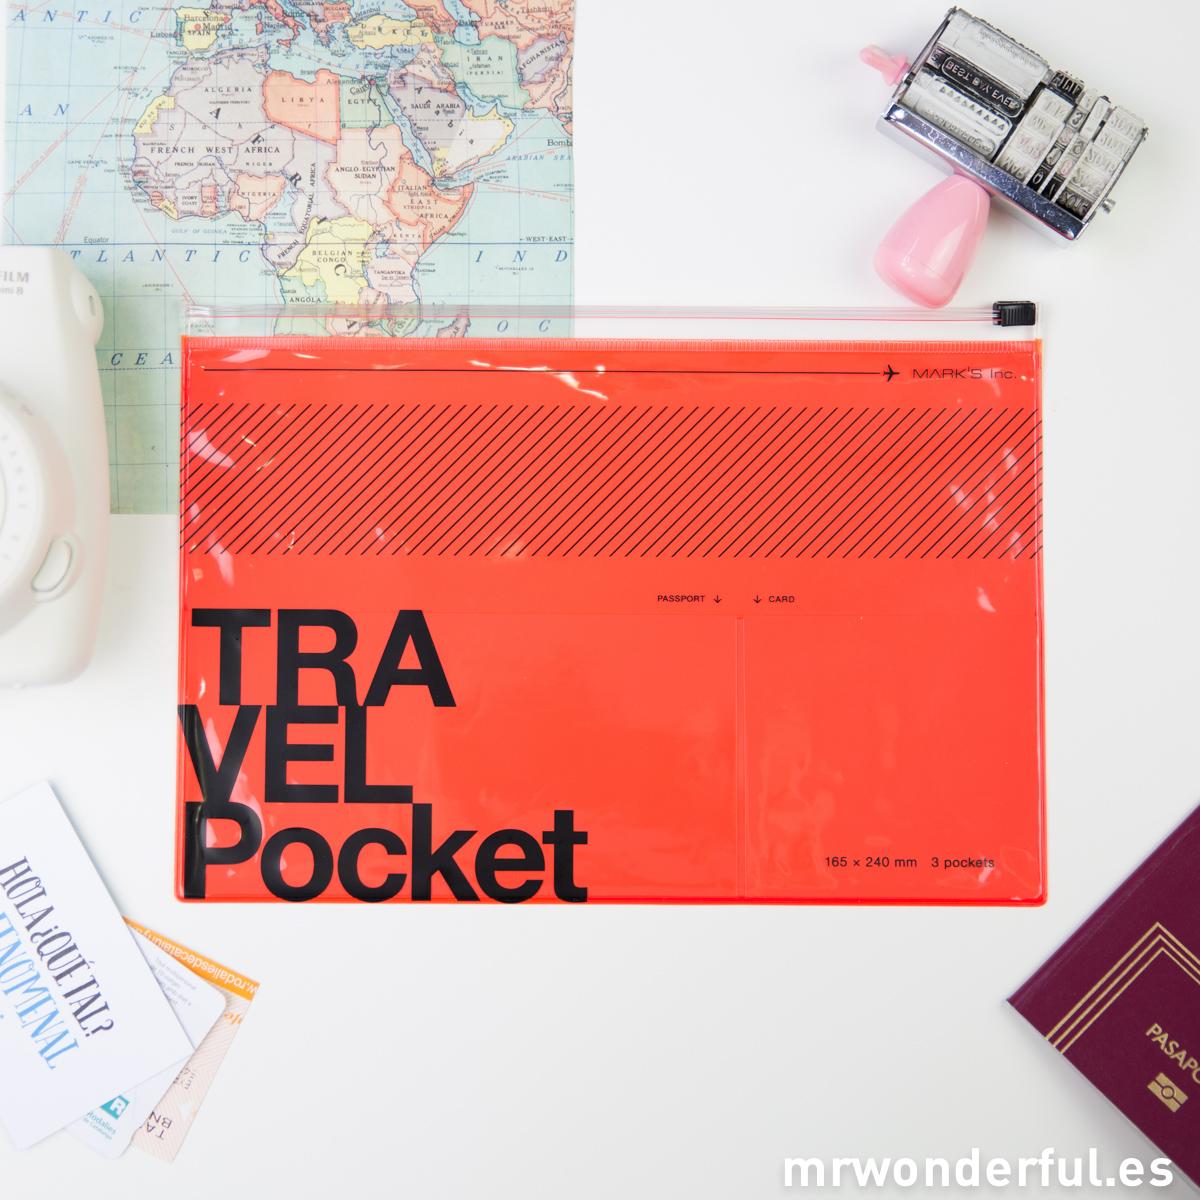 mrwonderful_TVK-VC1-ROR_portadocumentos-viaje-naranja-3